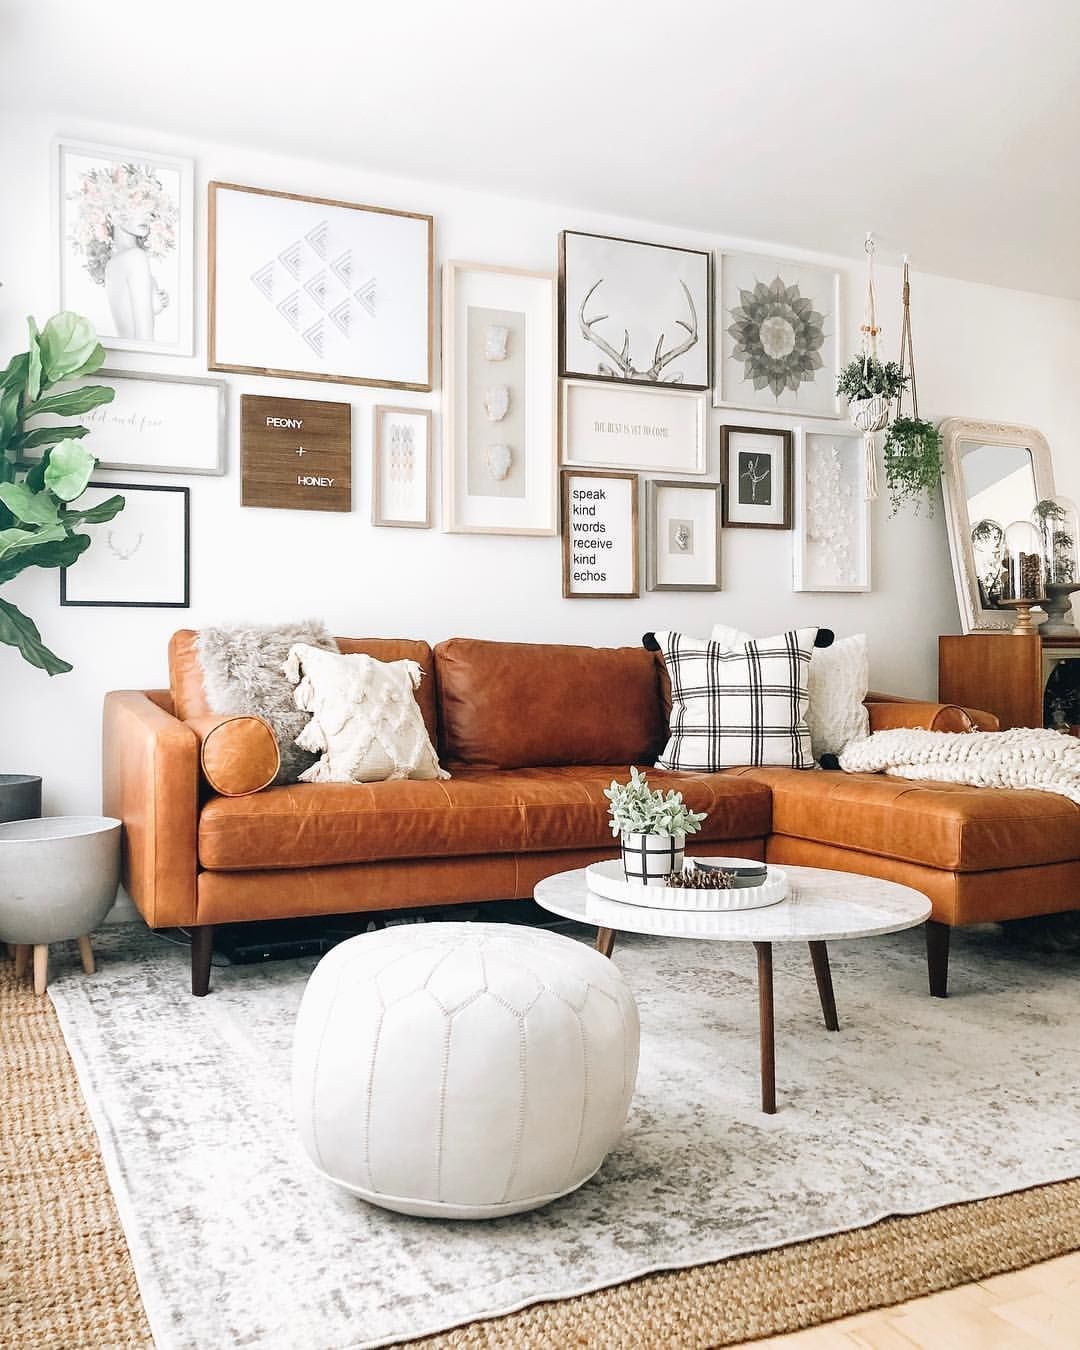 Pin by Renee Amberg on Living Room in 2020   Tan living ...